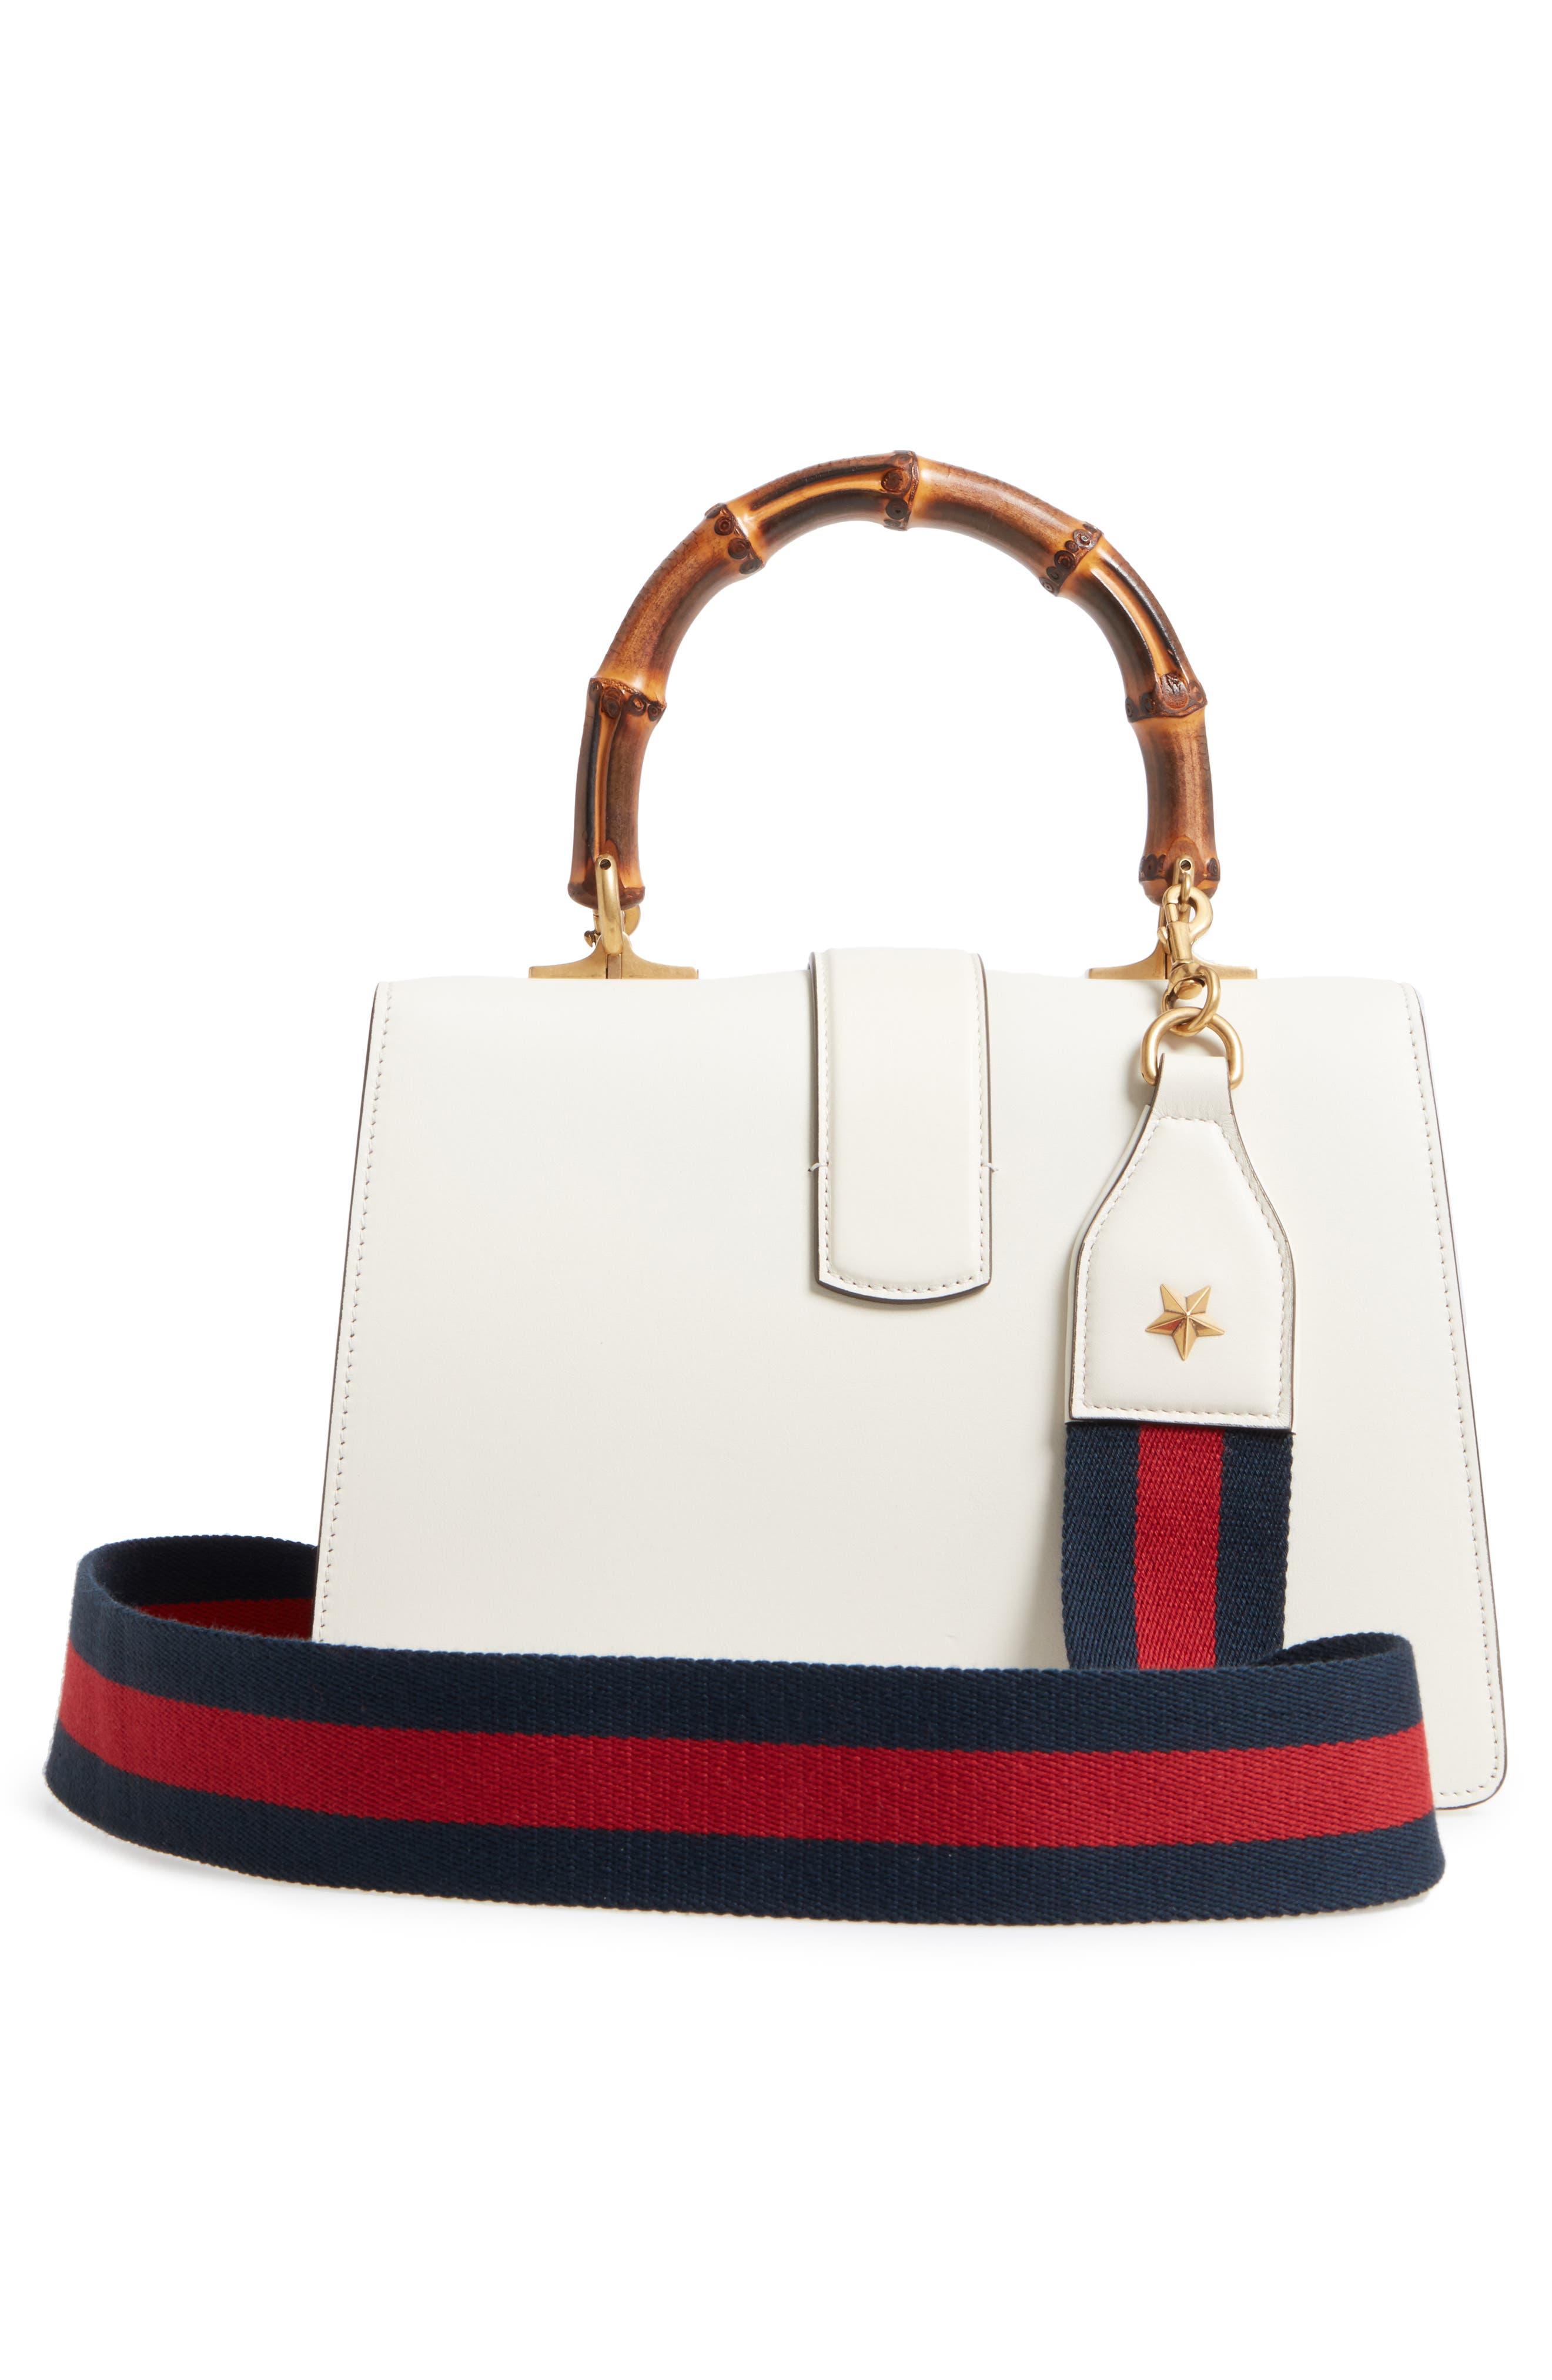 Alternate Image 2  - Gucci Small Dionysus Top Handle Leather Shoulder Bag